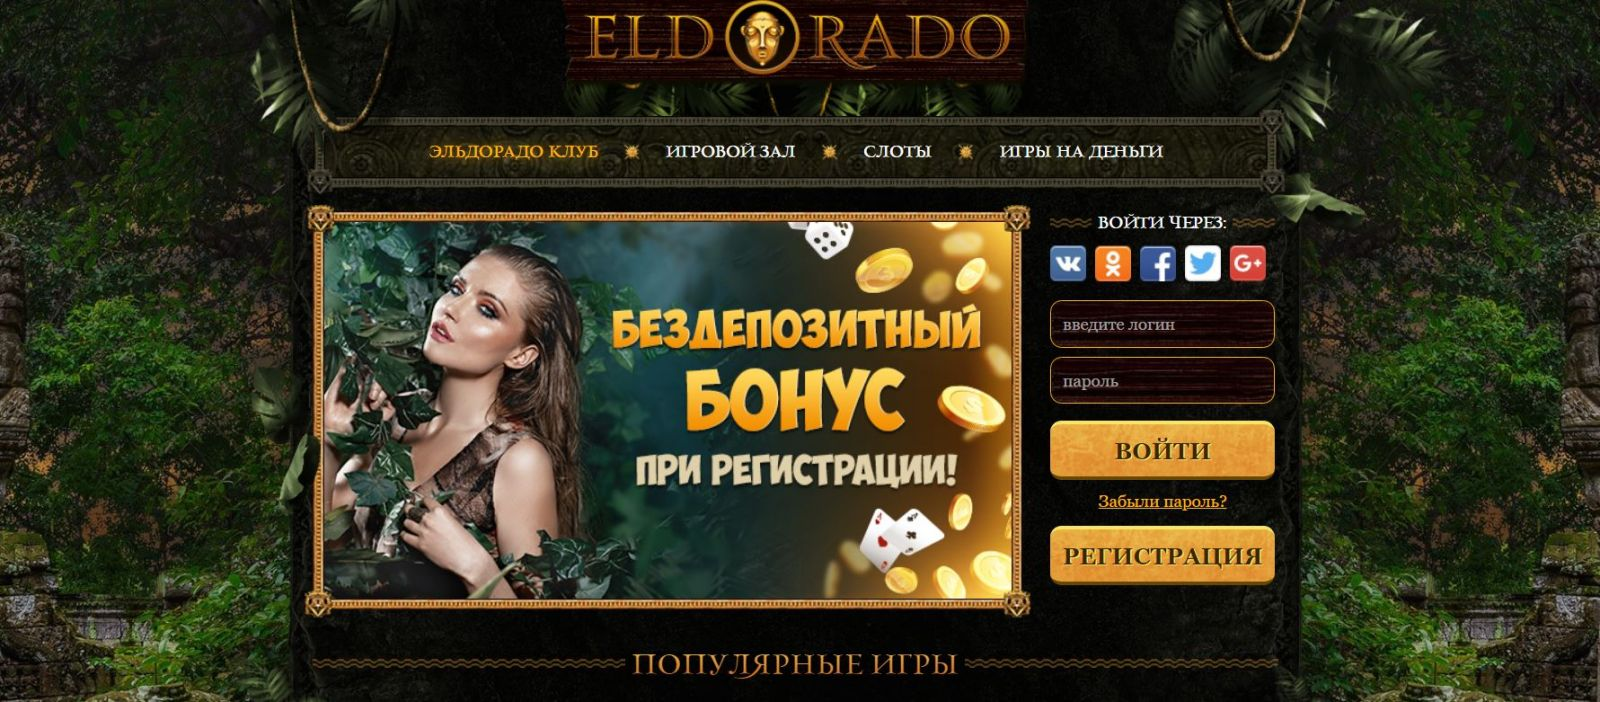 эльдорадо казино автоматы онлайн